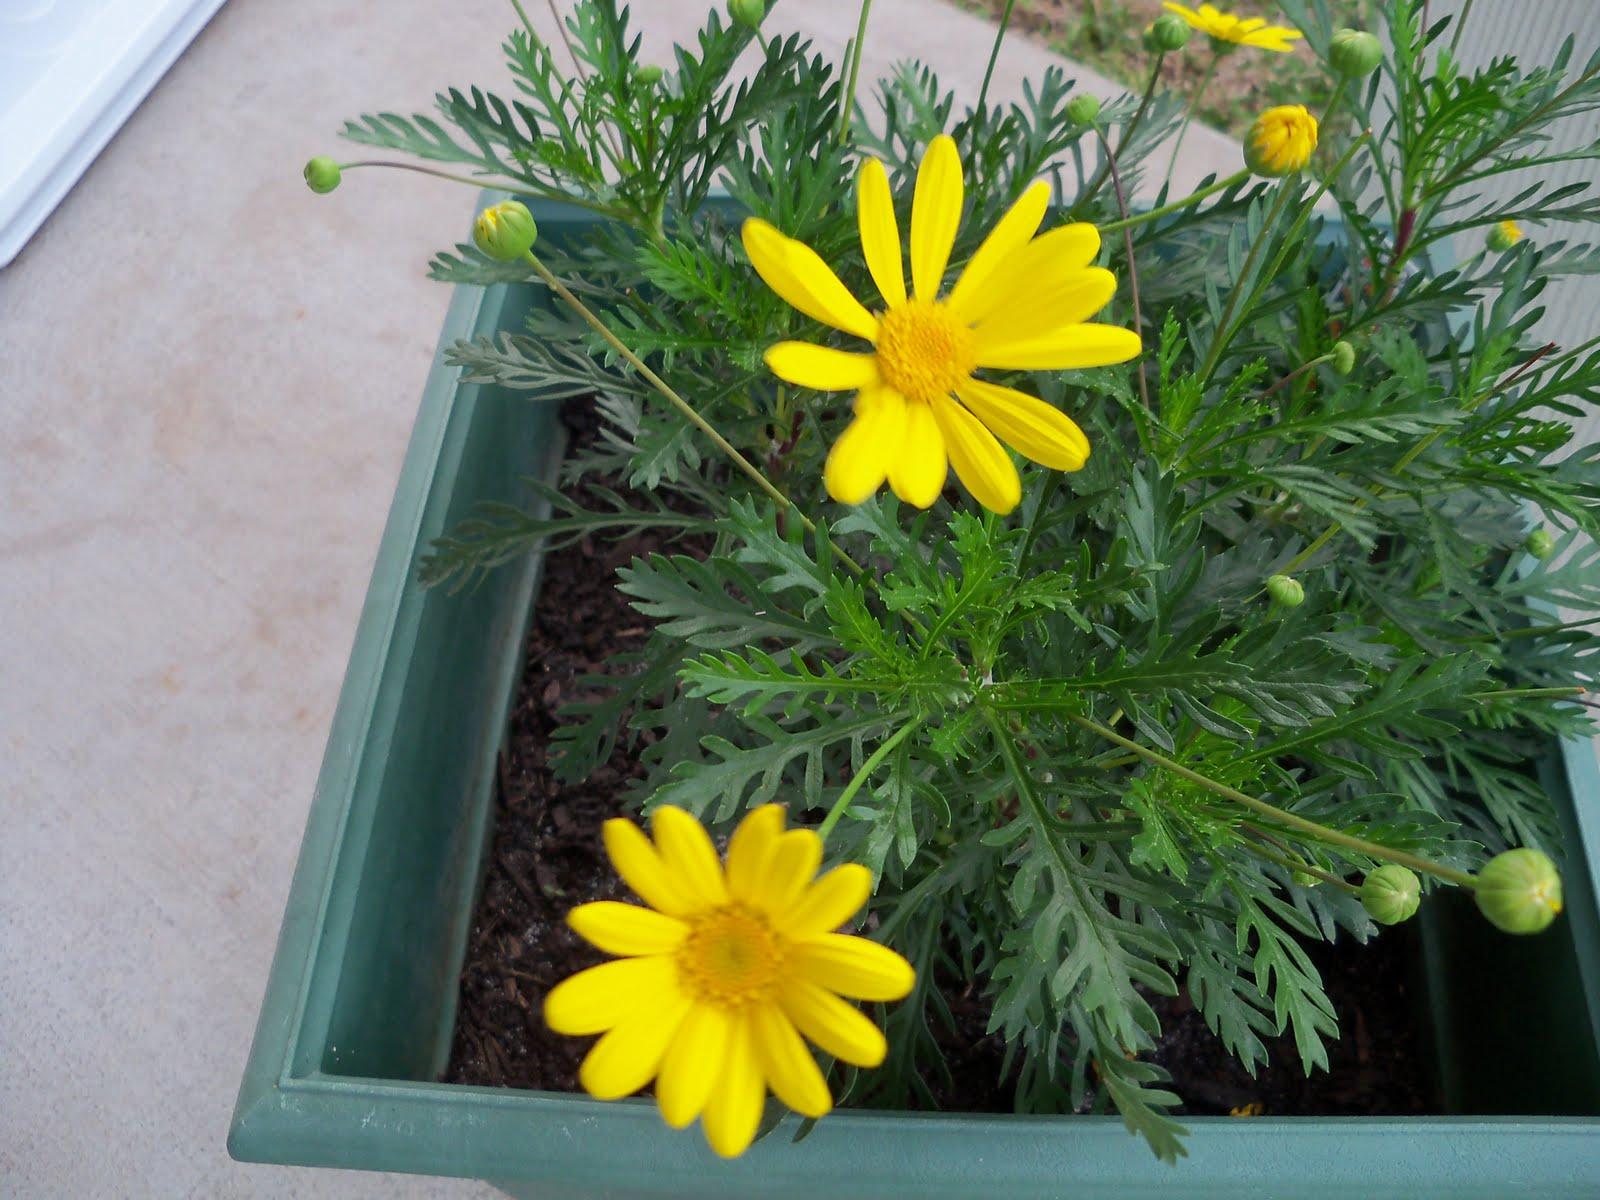 Gardening 2010 - 101_0969.JPG